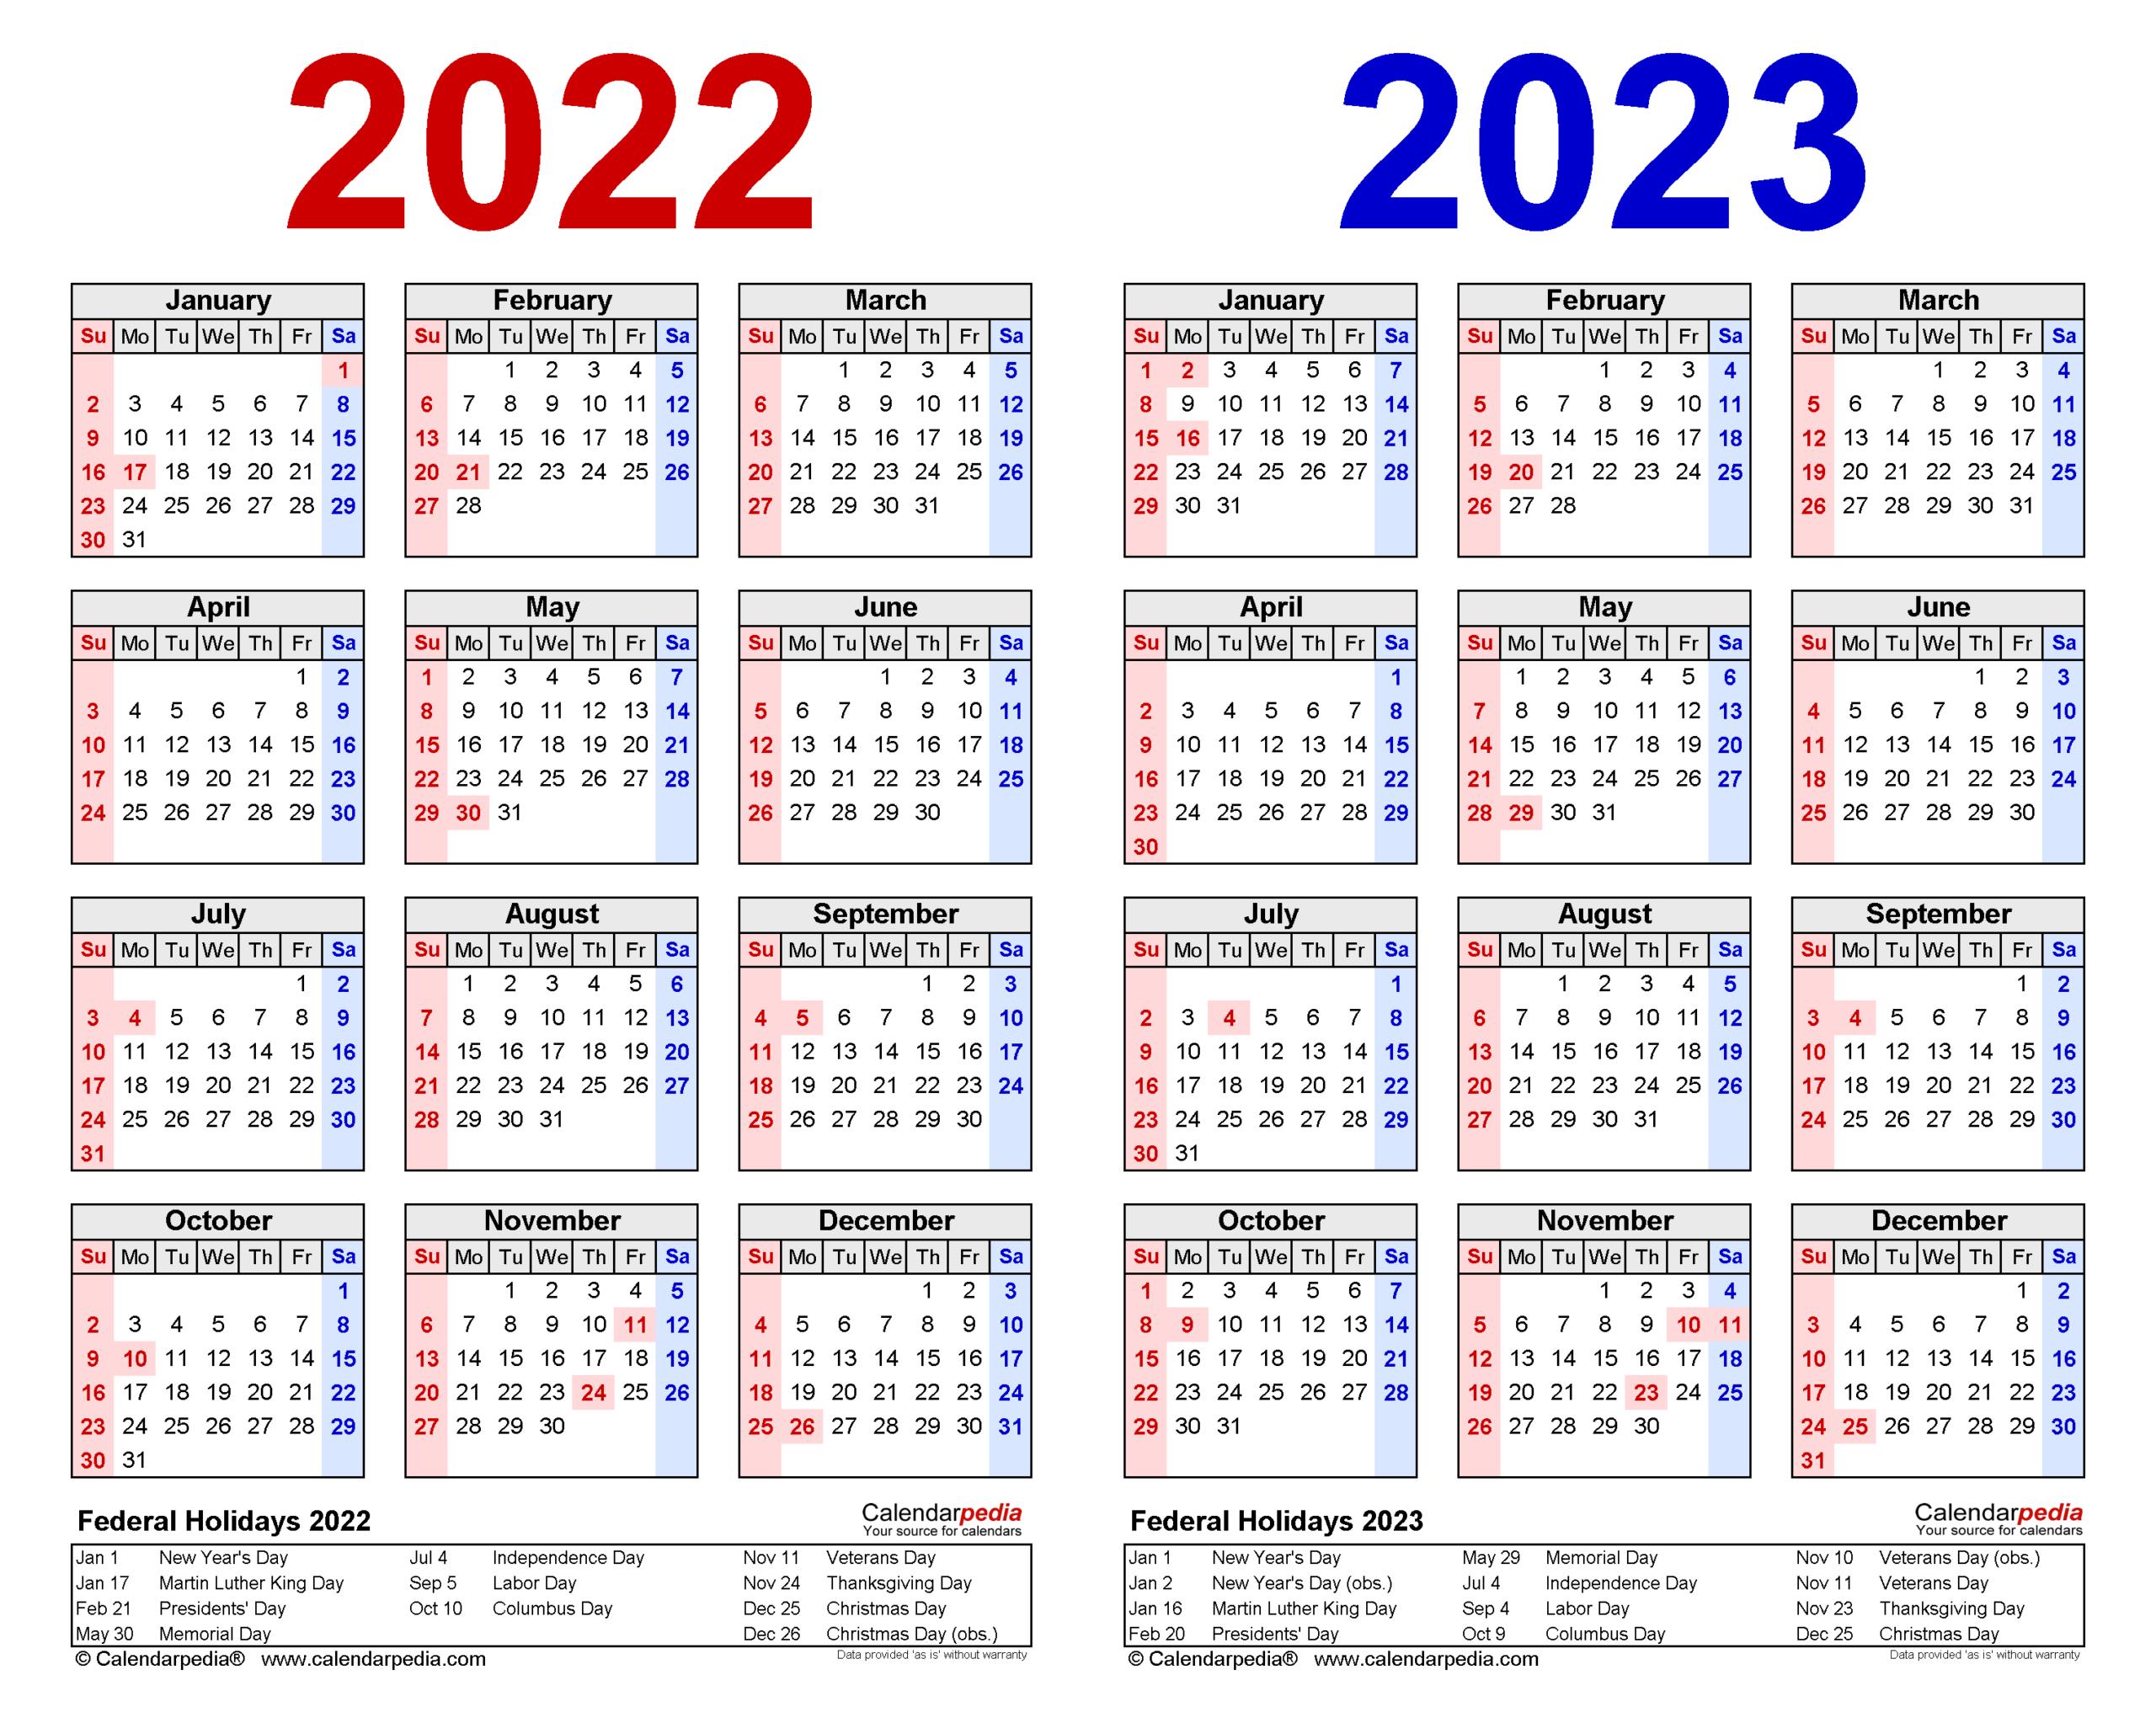 2022-2023 Two Year Calendar - Free Printable Word Templates throughout U Of Minnesota 2022 Acedamic Calendar